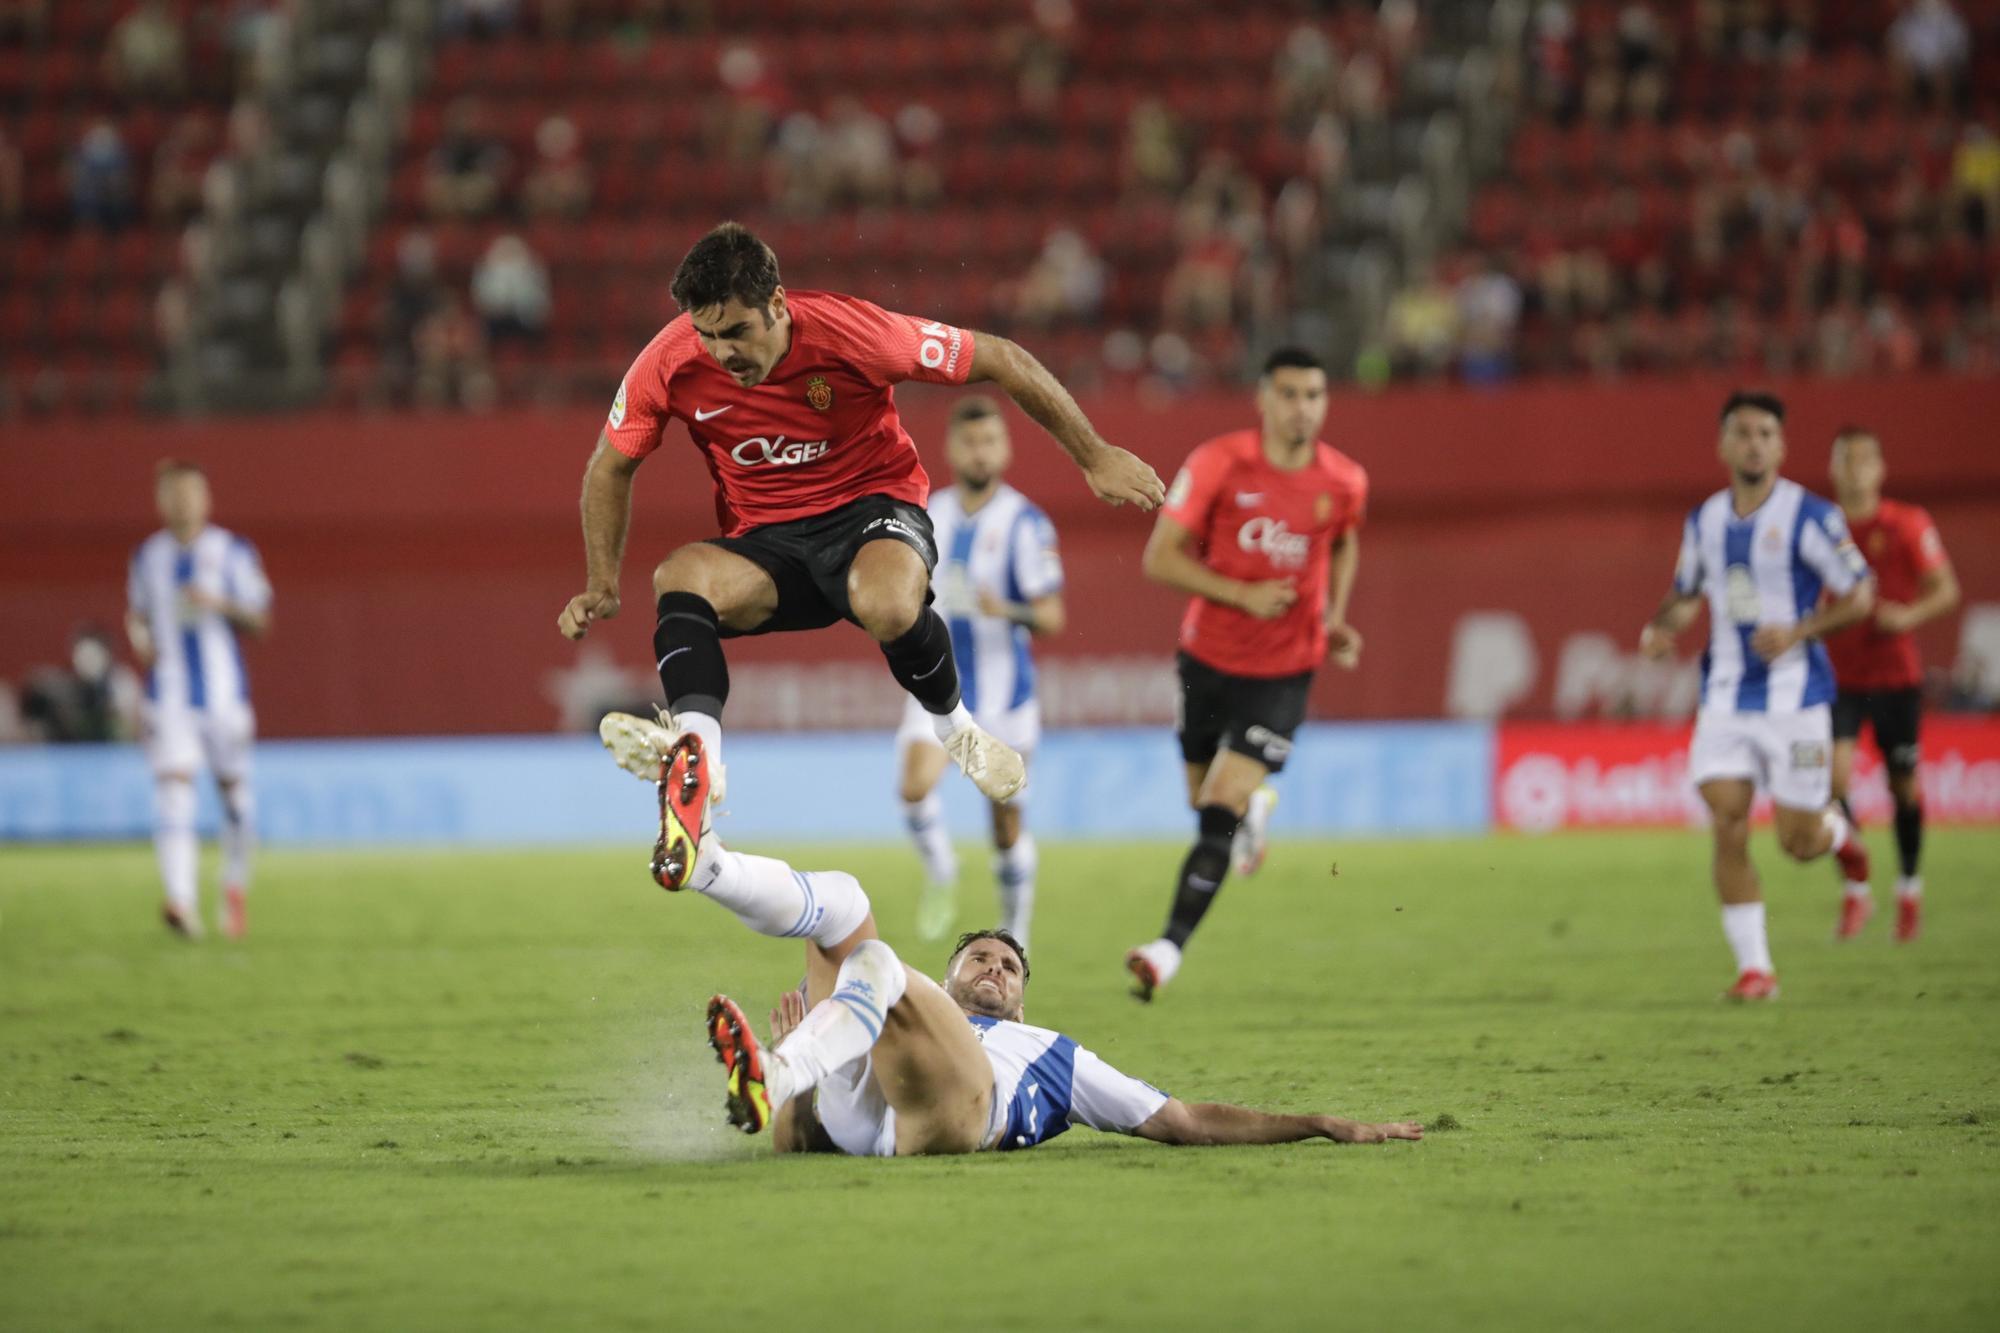 Real Mallorca 1 - Espanyol 0